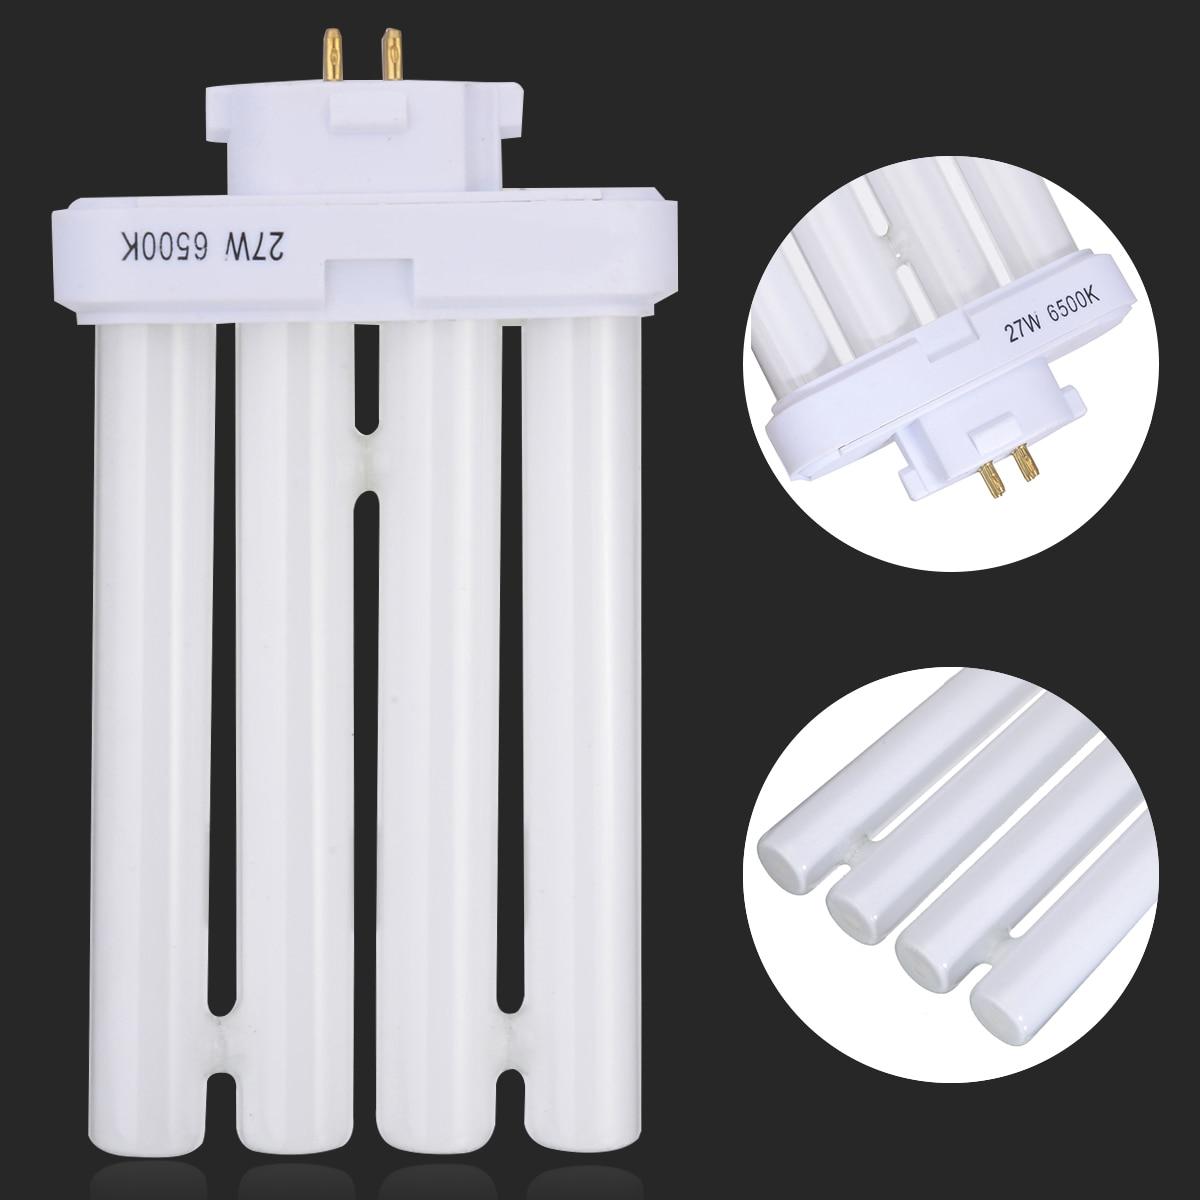 27W FML27/65K Energy Saving Light High Efficient 4 Pin Quad Tube Fluorescent Light Bulb Lamp Pure White Lights